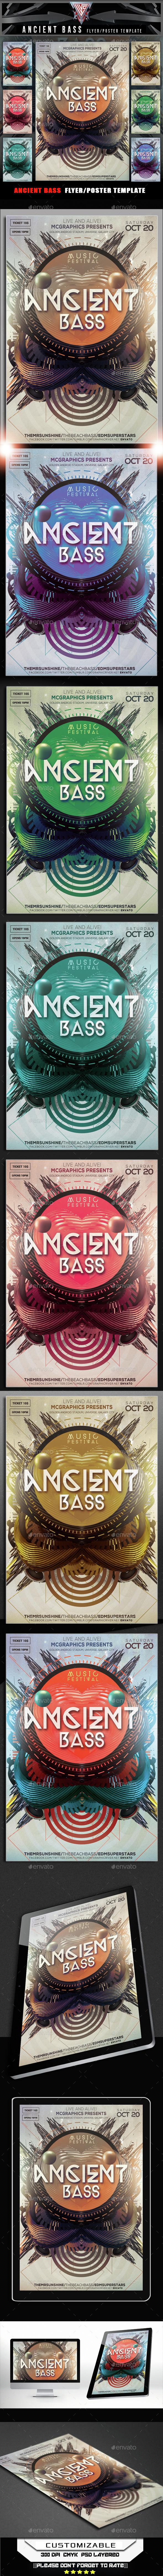 Ancient Bass Flyer Template - Flyers Print Templates